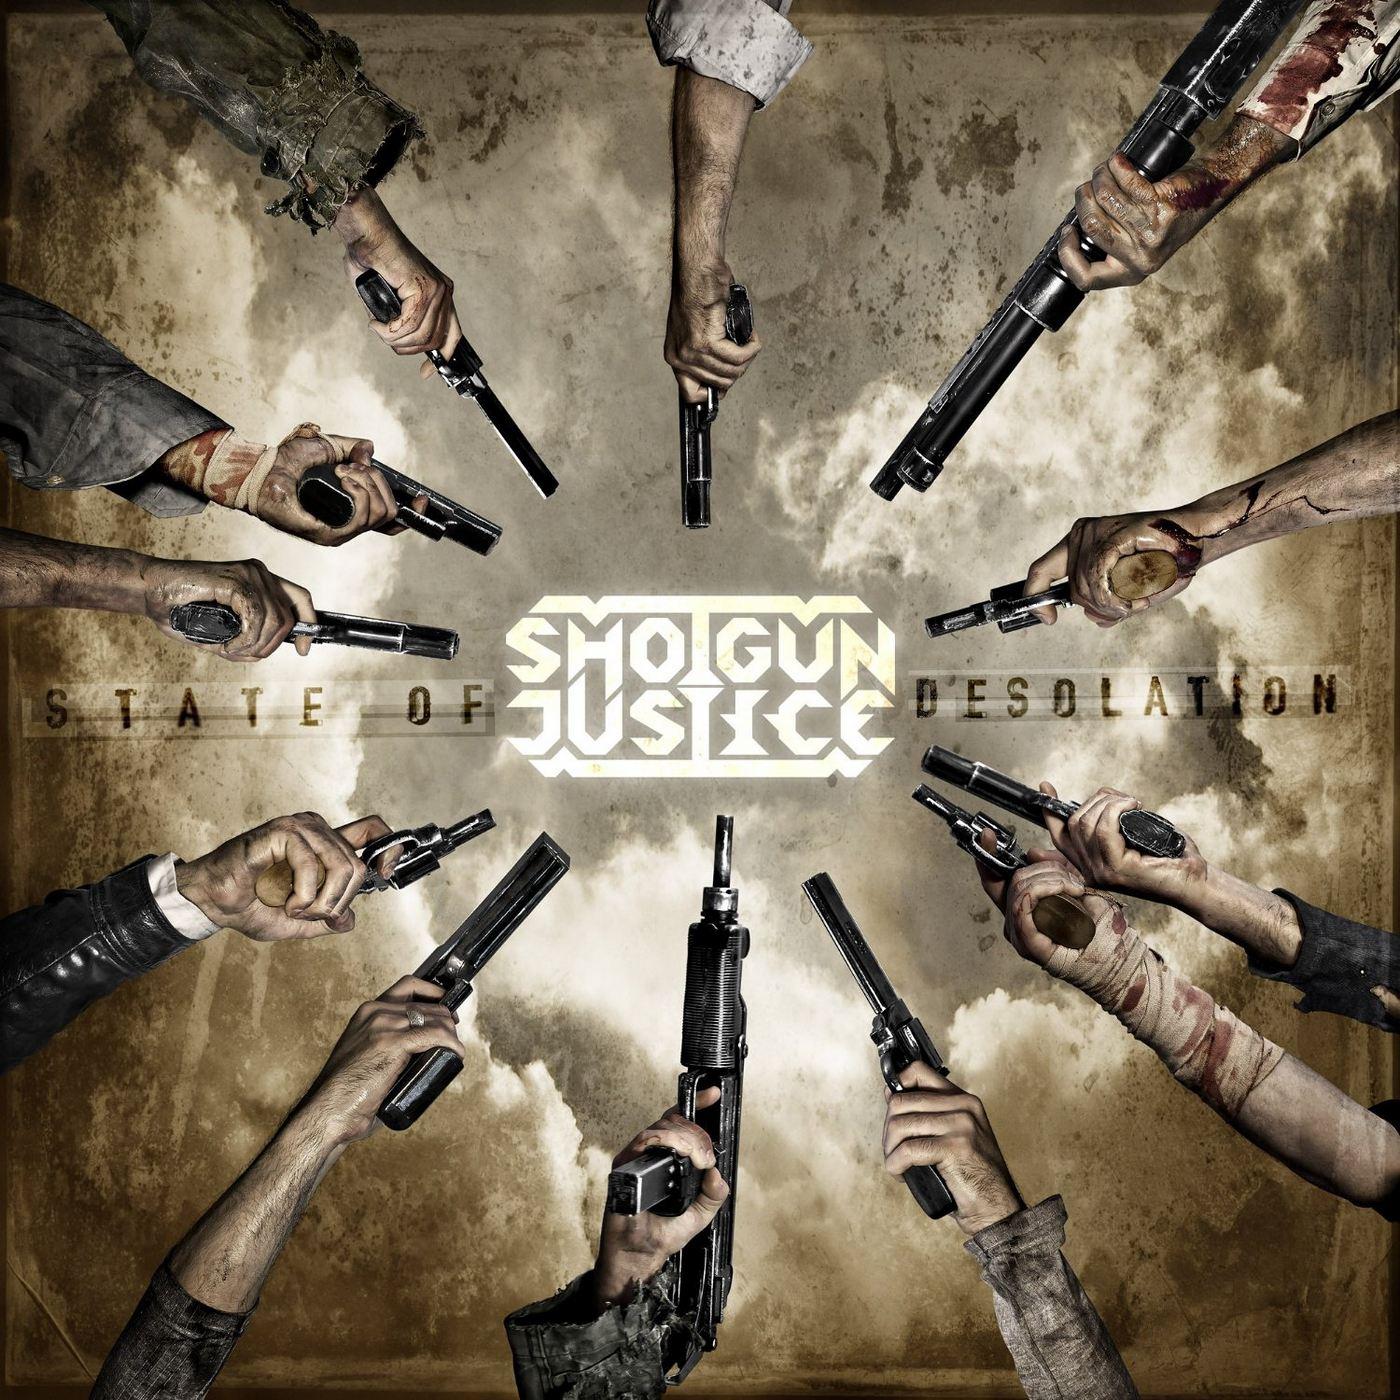 Shotgun Justice: State of Desolution (2016) Book Cover